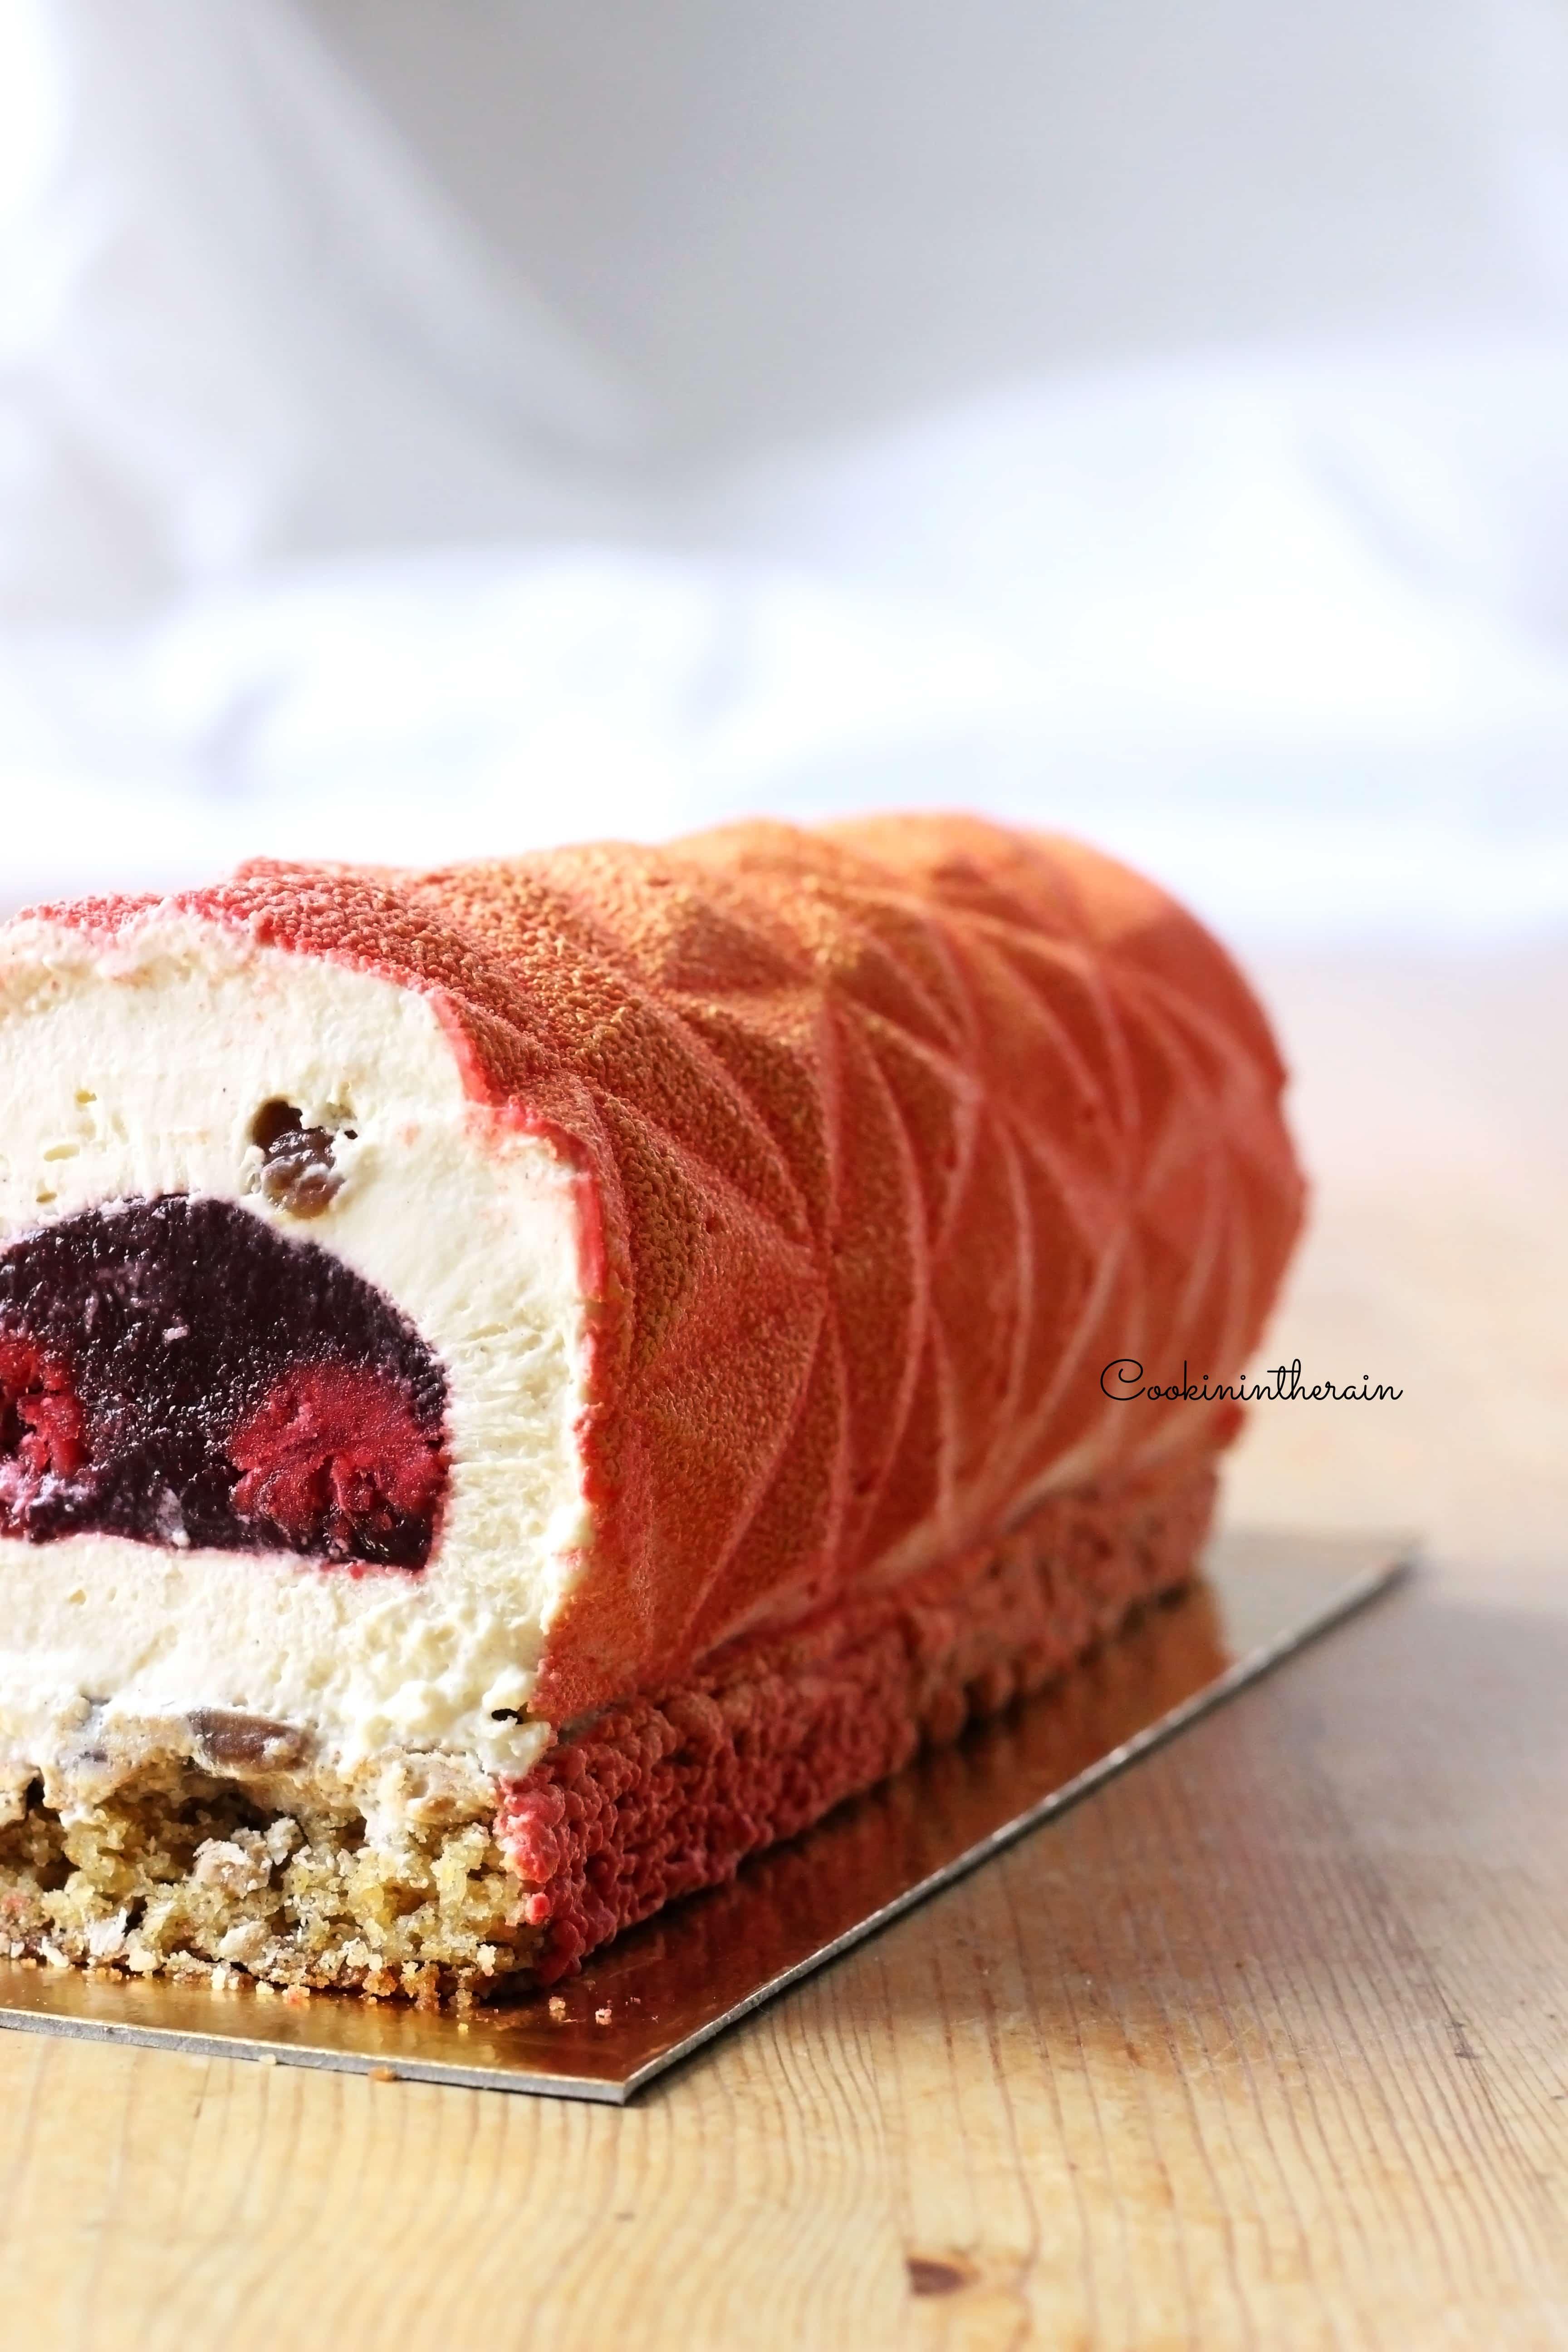 Bûche marron framboise - Cookinintherain